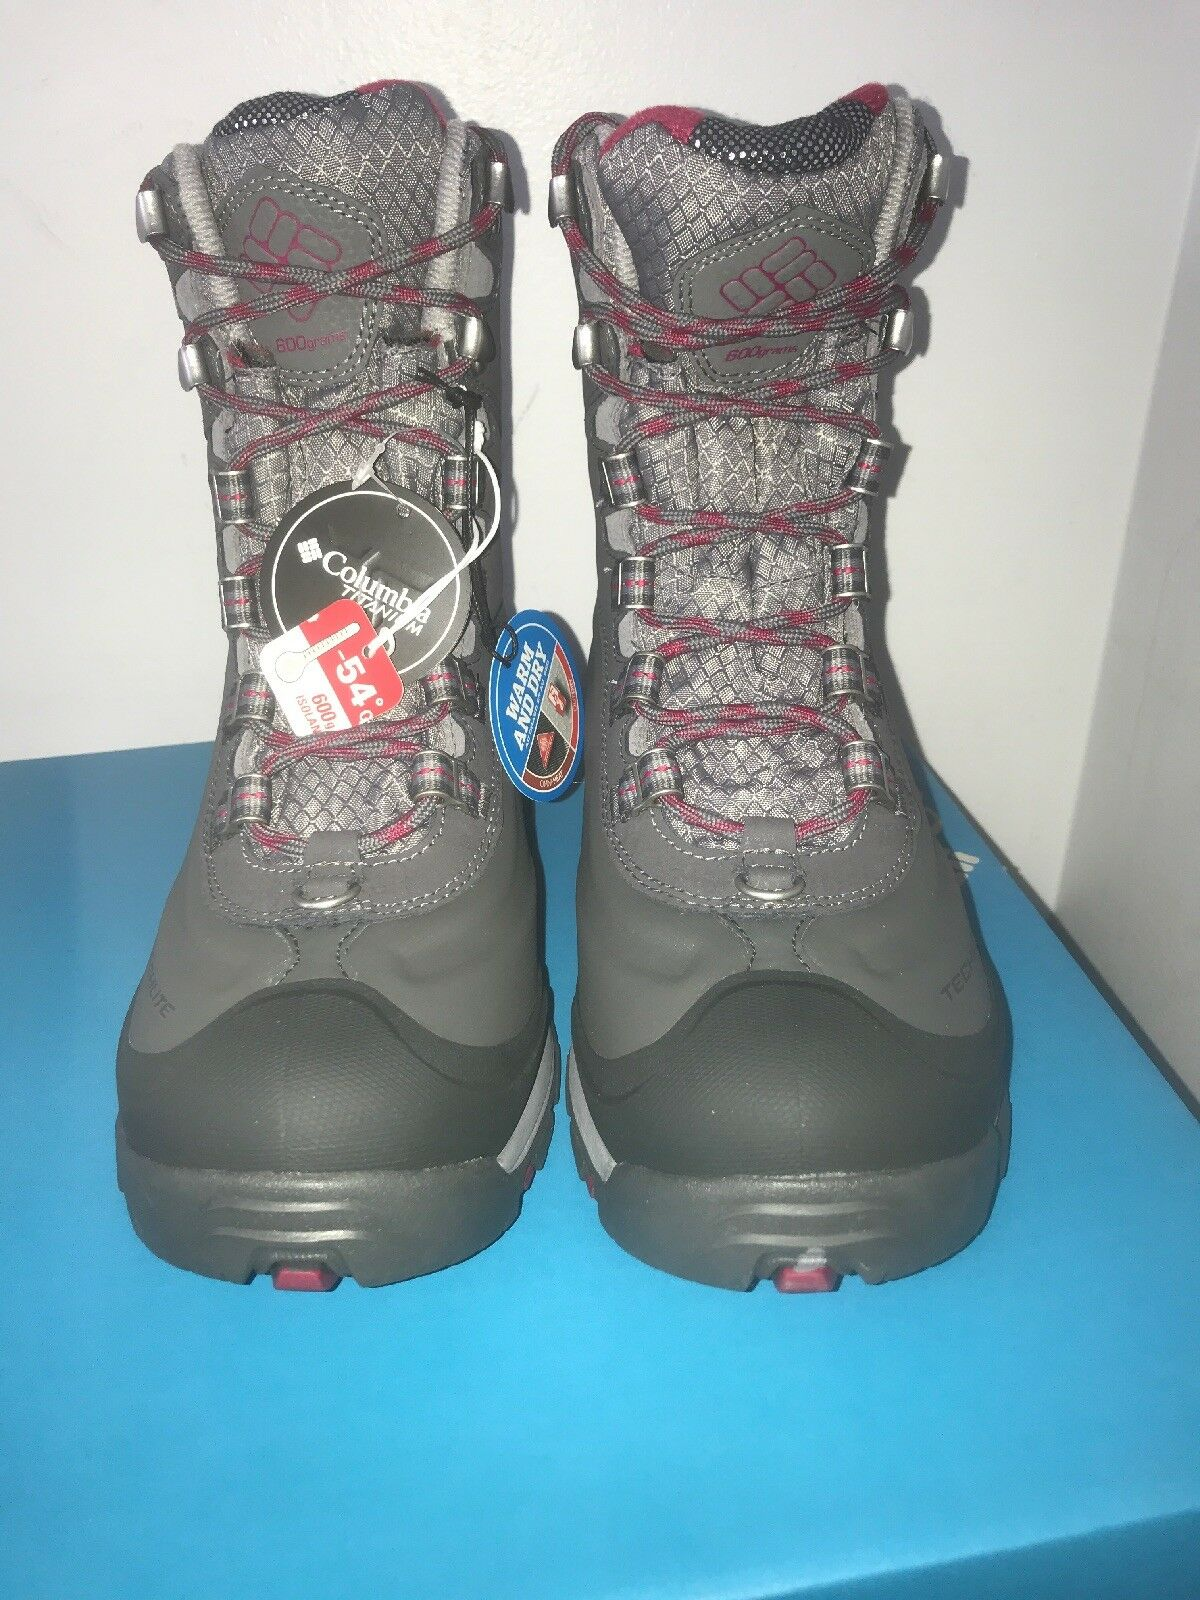 NIB Womens Columbia Bugaboot Plus 3 Titanium Omni-Heat Outdry Snow Boots sz 5.5